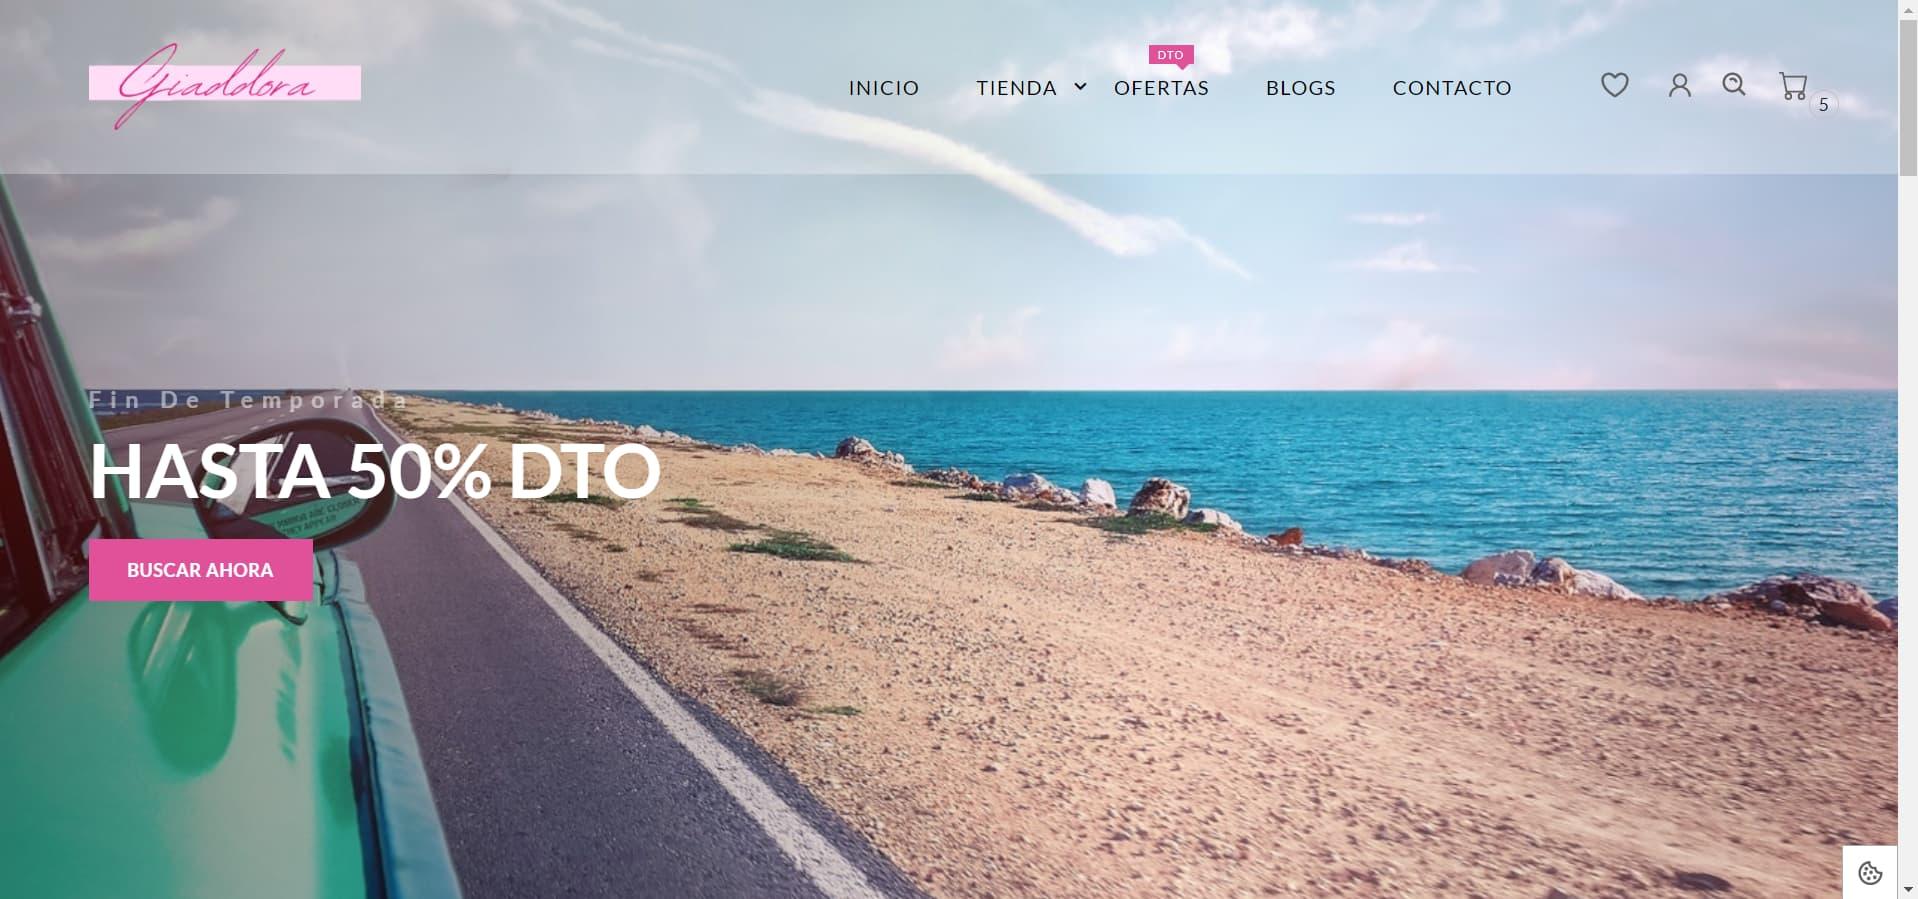 pagina web Giaddora